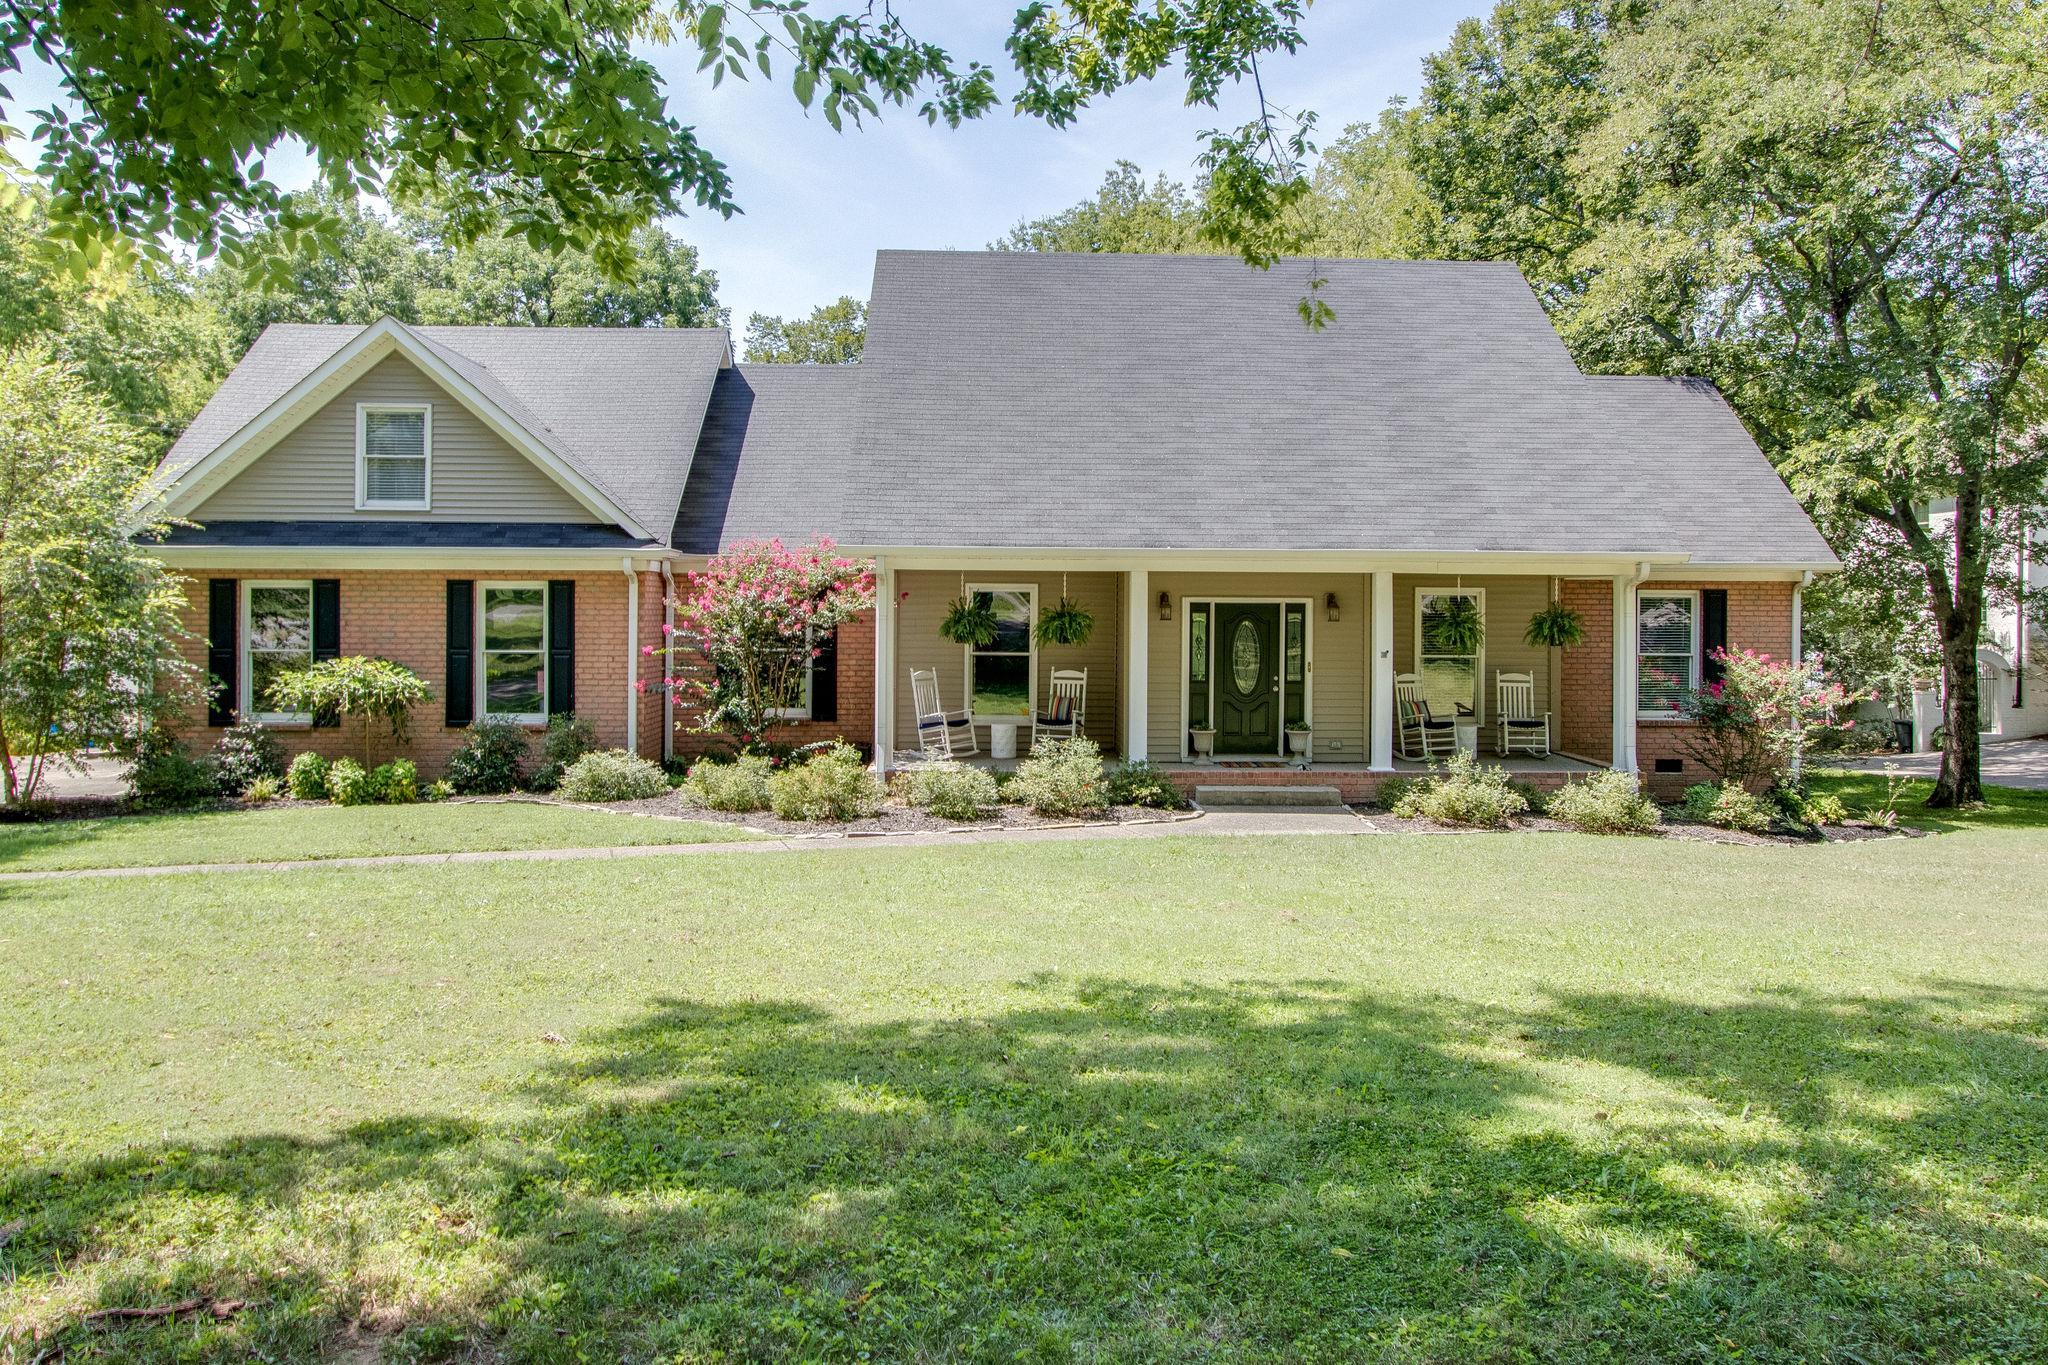 $595,900 - 4Br/5Ba -  for Sale in Cherokee Woods Sec 7, Hendersonville